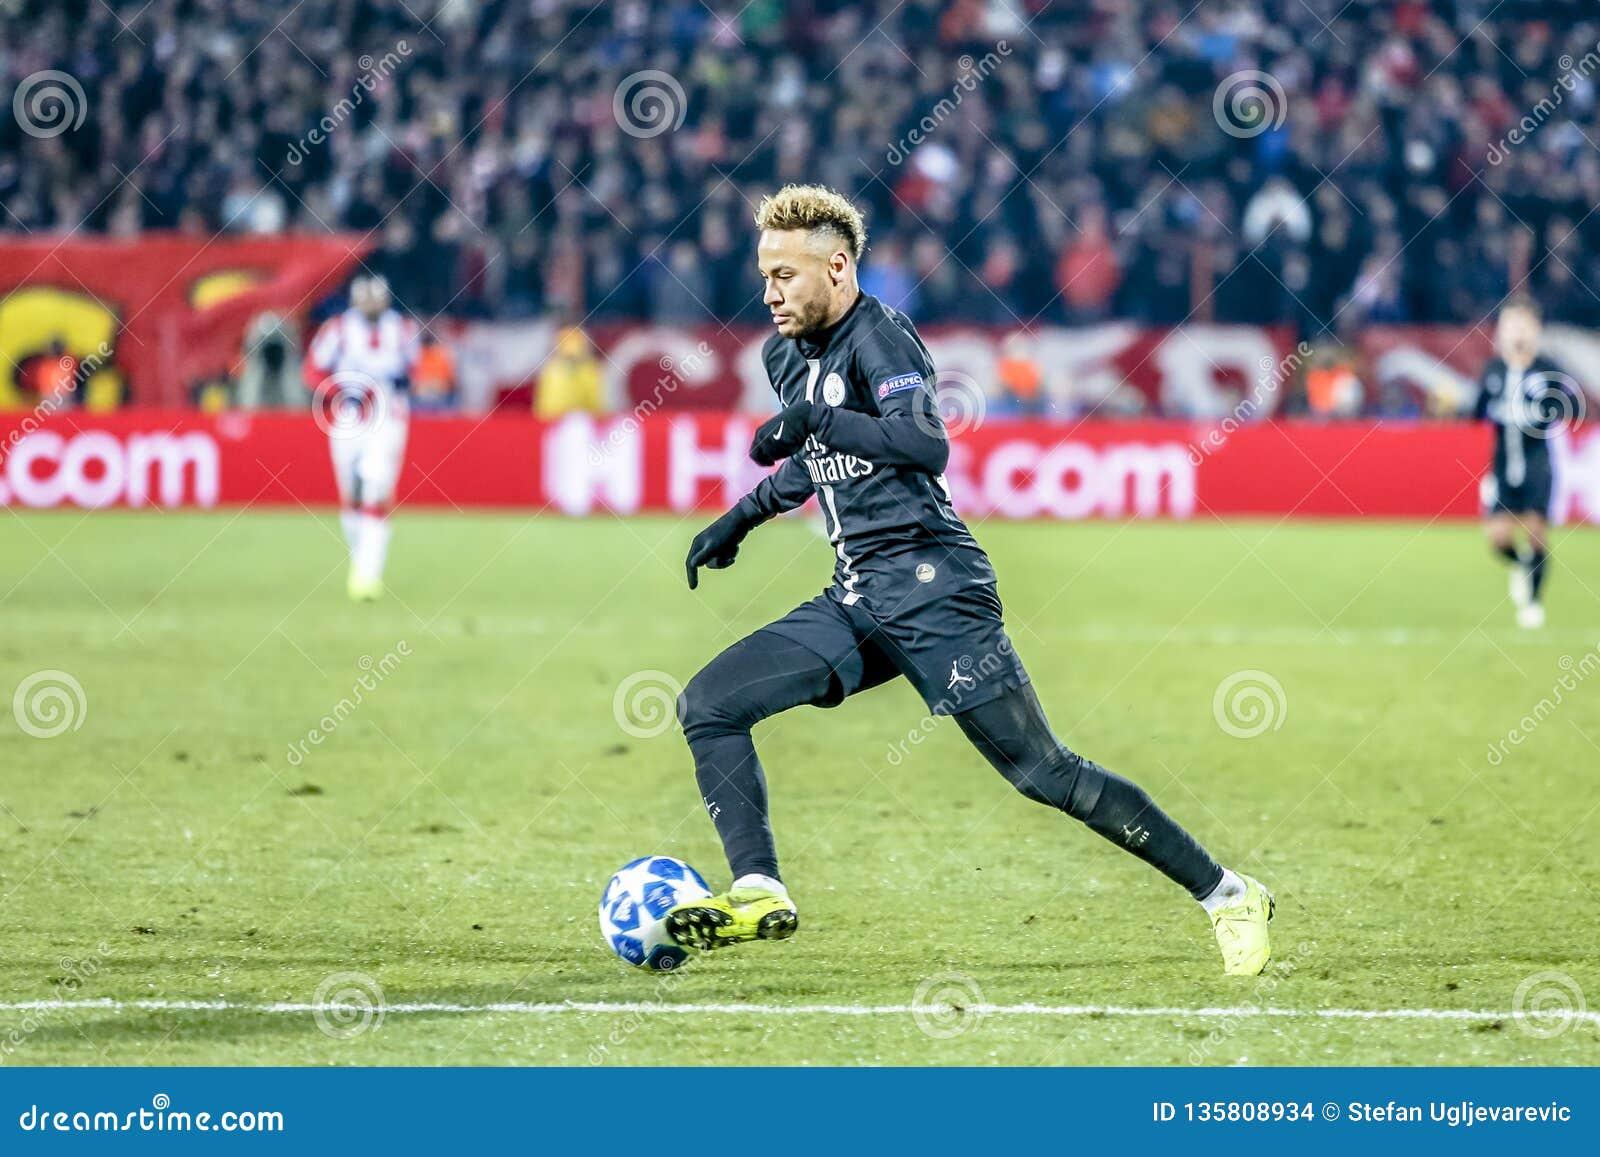 Neymar playing on a UEFA Champions League match